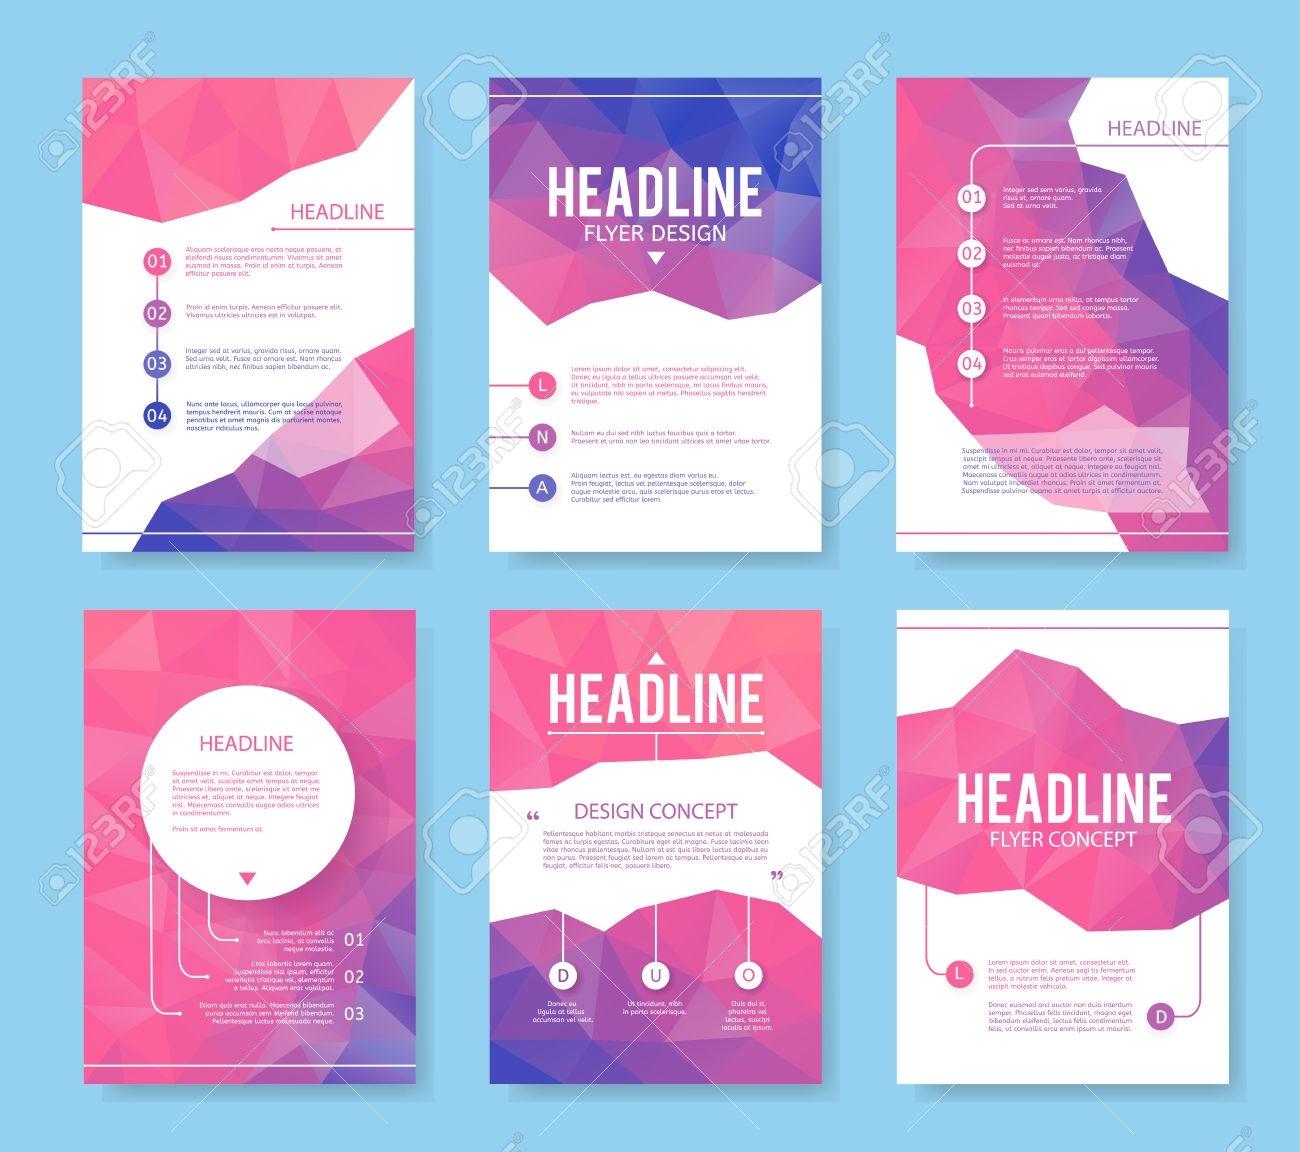 Blank Brochure Templates Free Inspirational Blank Flyer Templates - Free Printable Flyer Templates